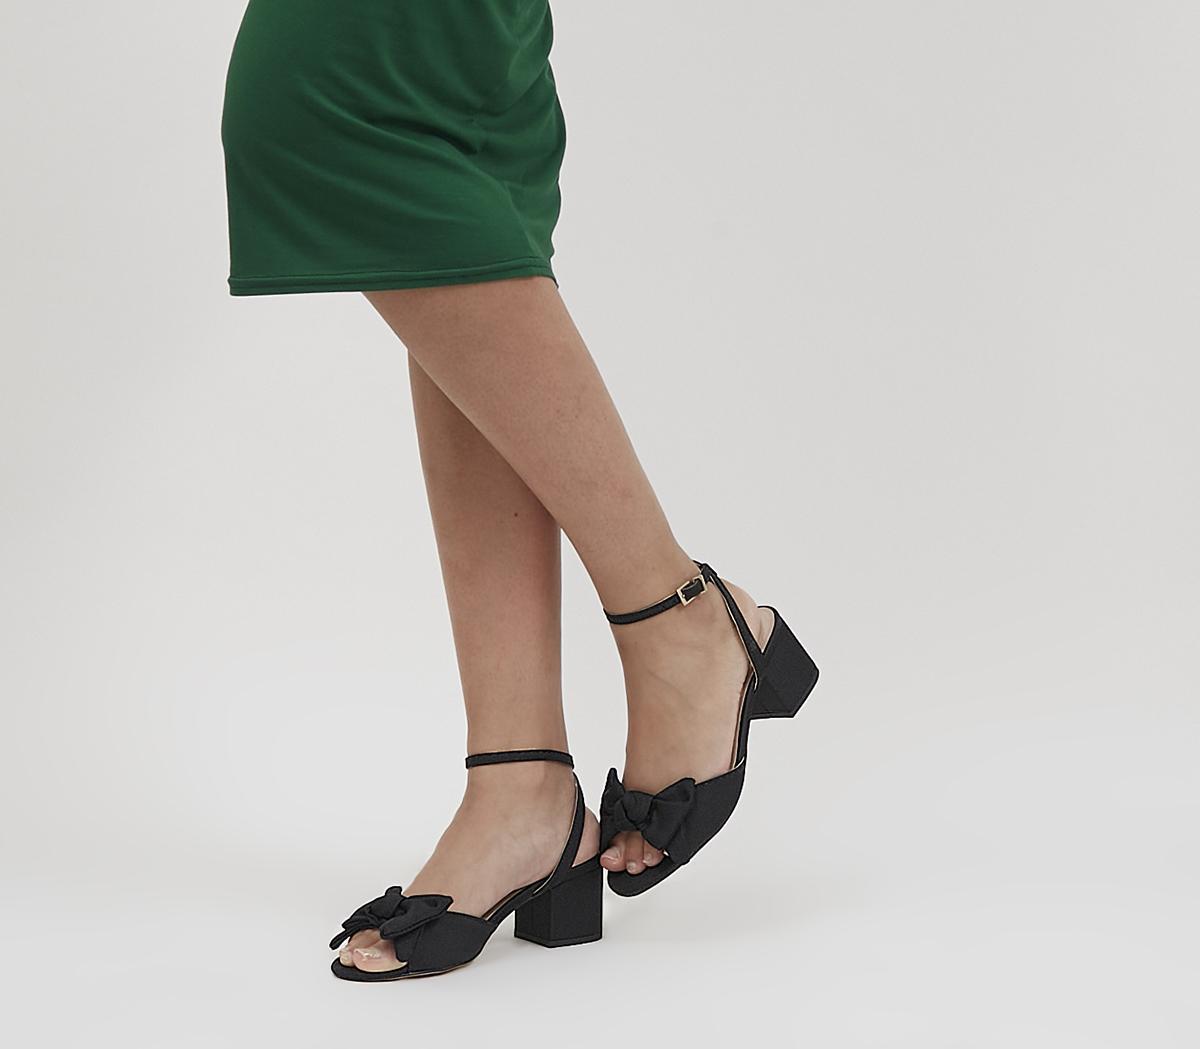 Maybe-baby Bow Block Heels